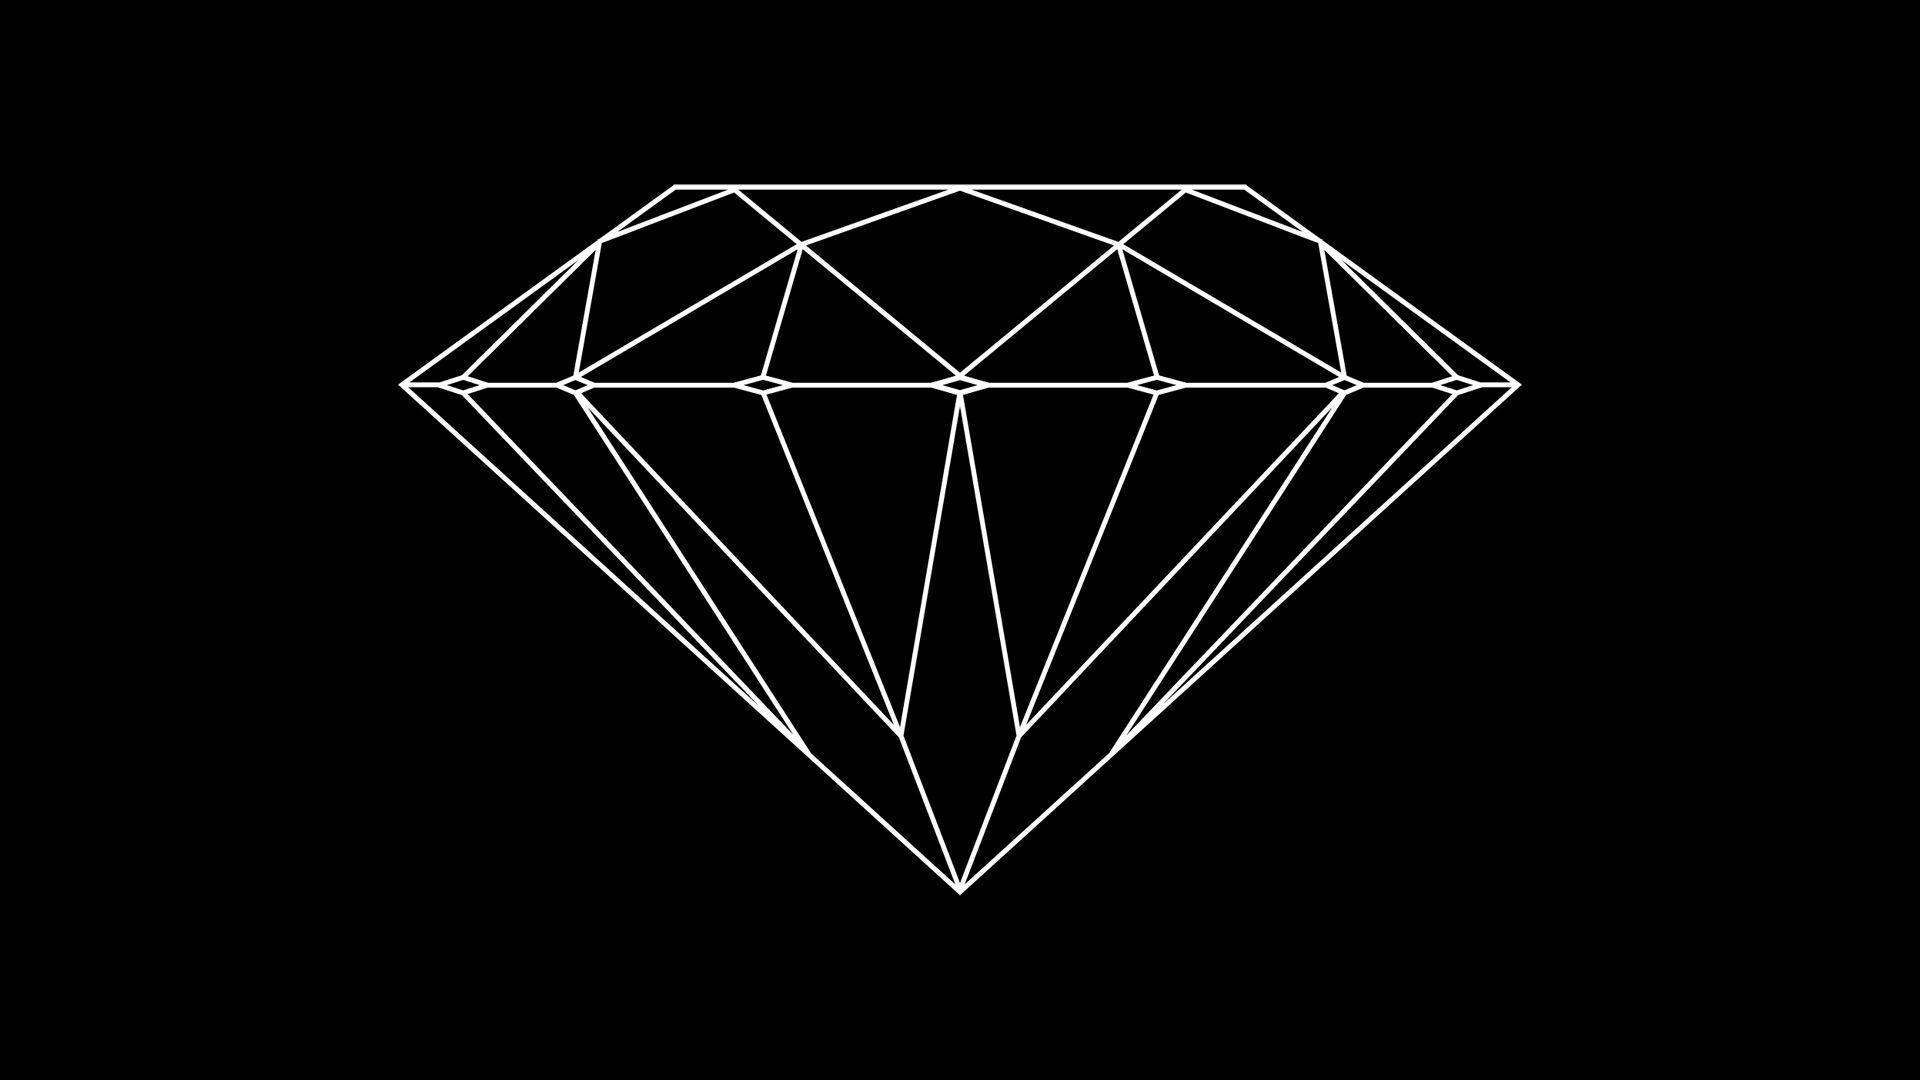 17 Best Ideas About Diamond Wallpaper On Pinterest Black Black Diamond Wallpaper Diamond Supply Co Wallpaper Diamond Wallpaper